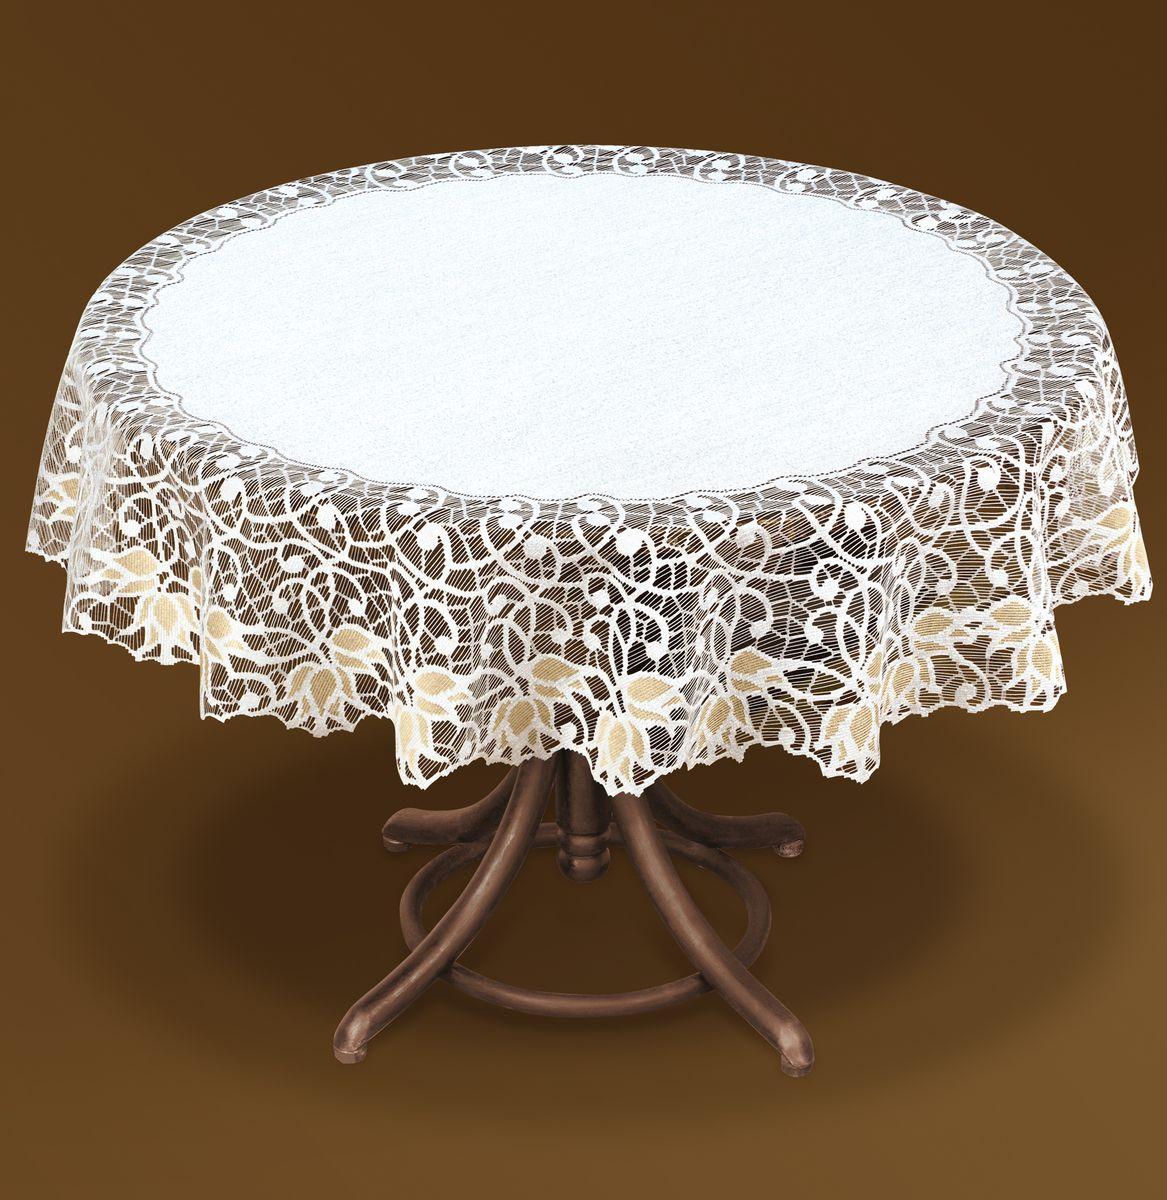 Картинка круглого стола со скатертью